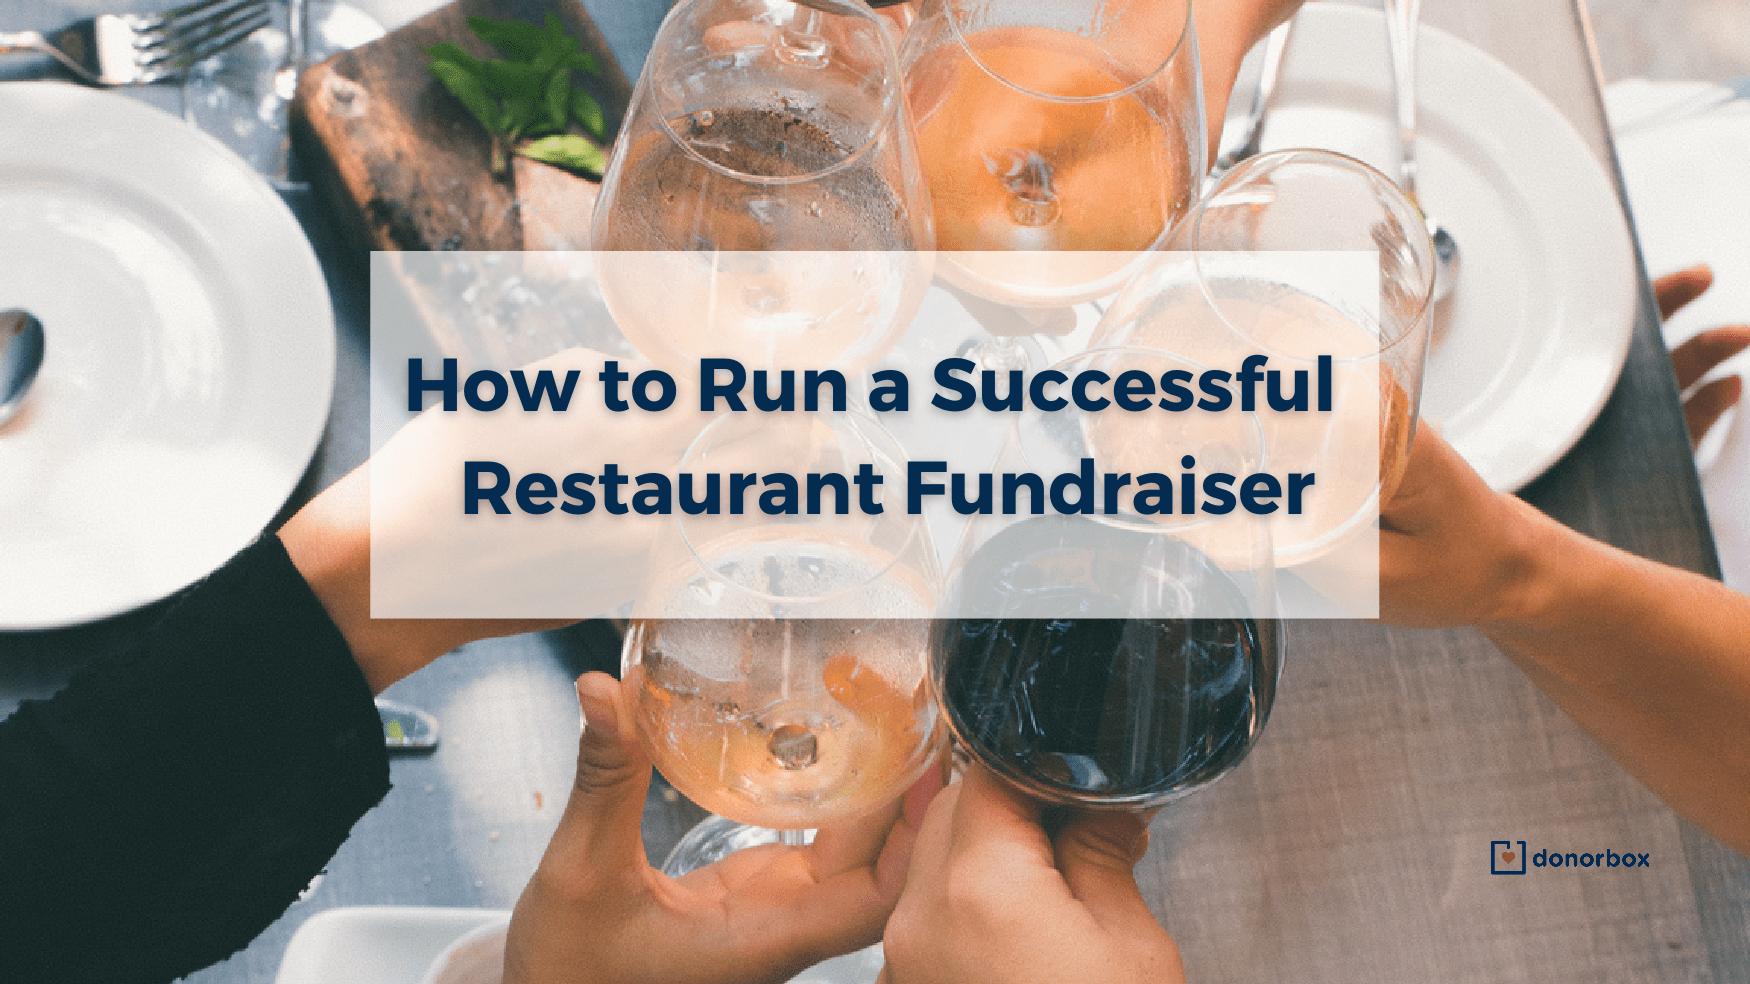 how to run a restaurant fundraiser